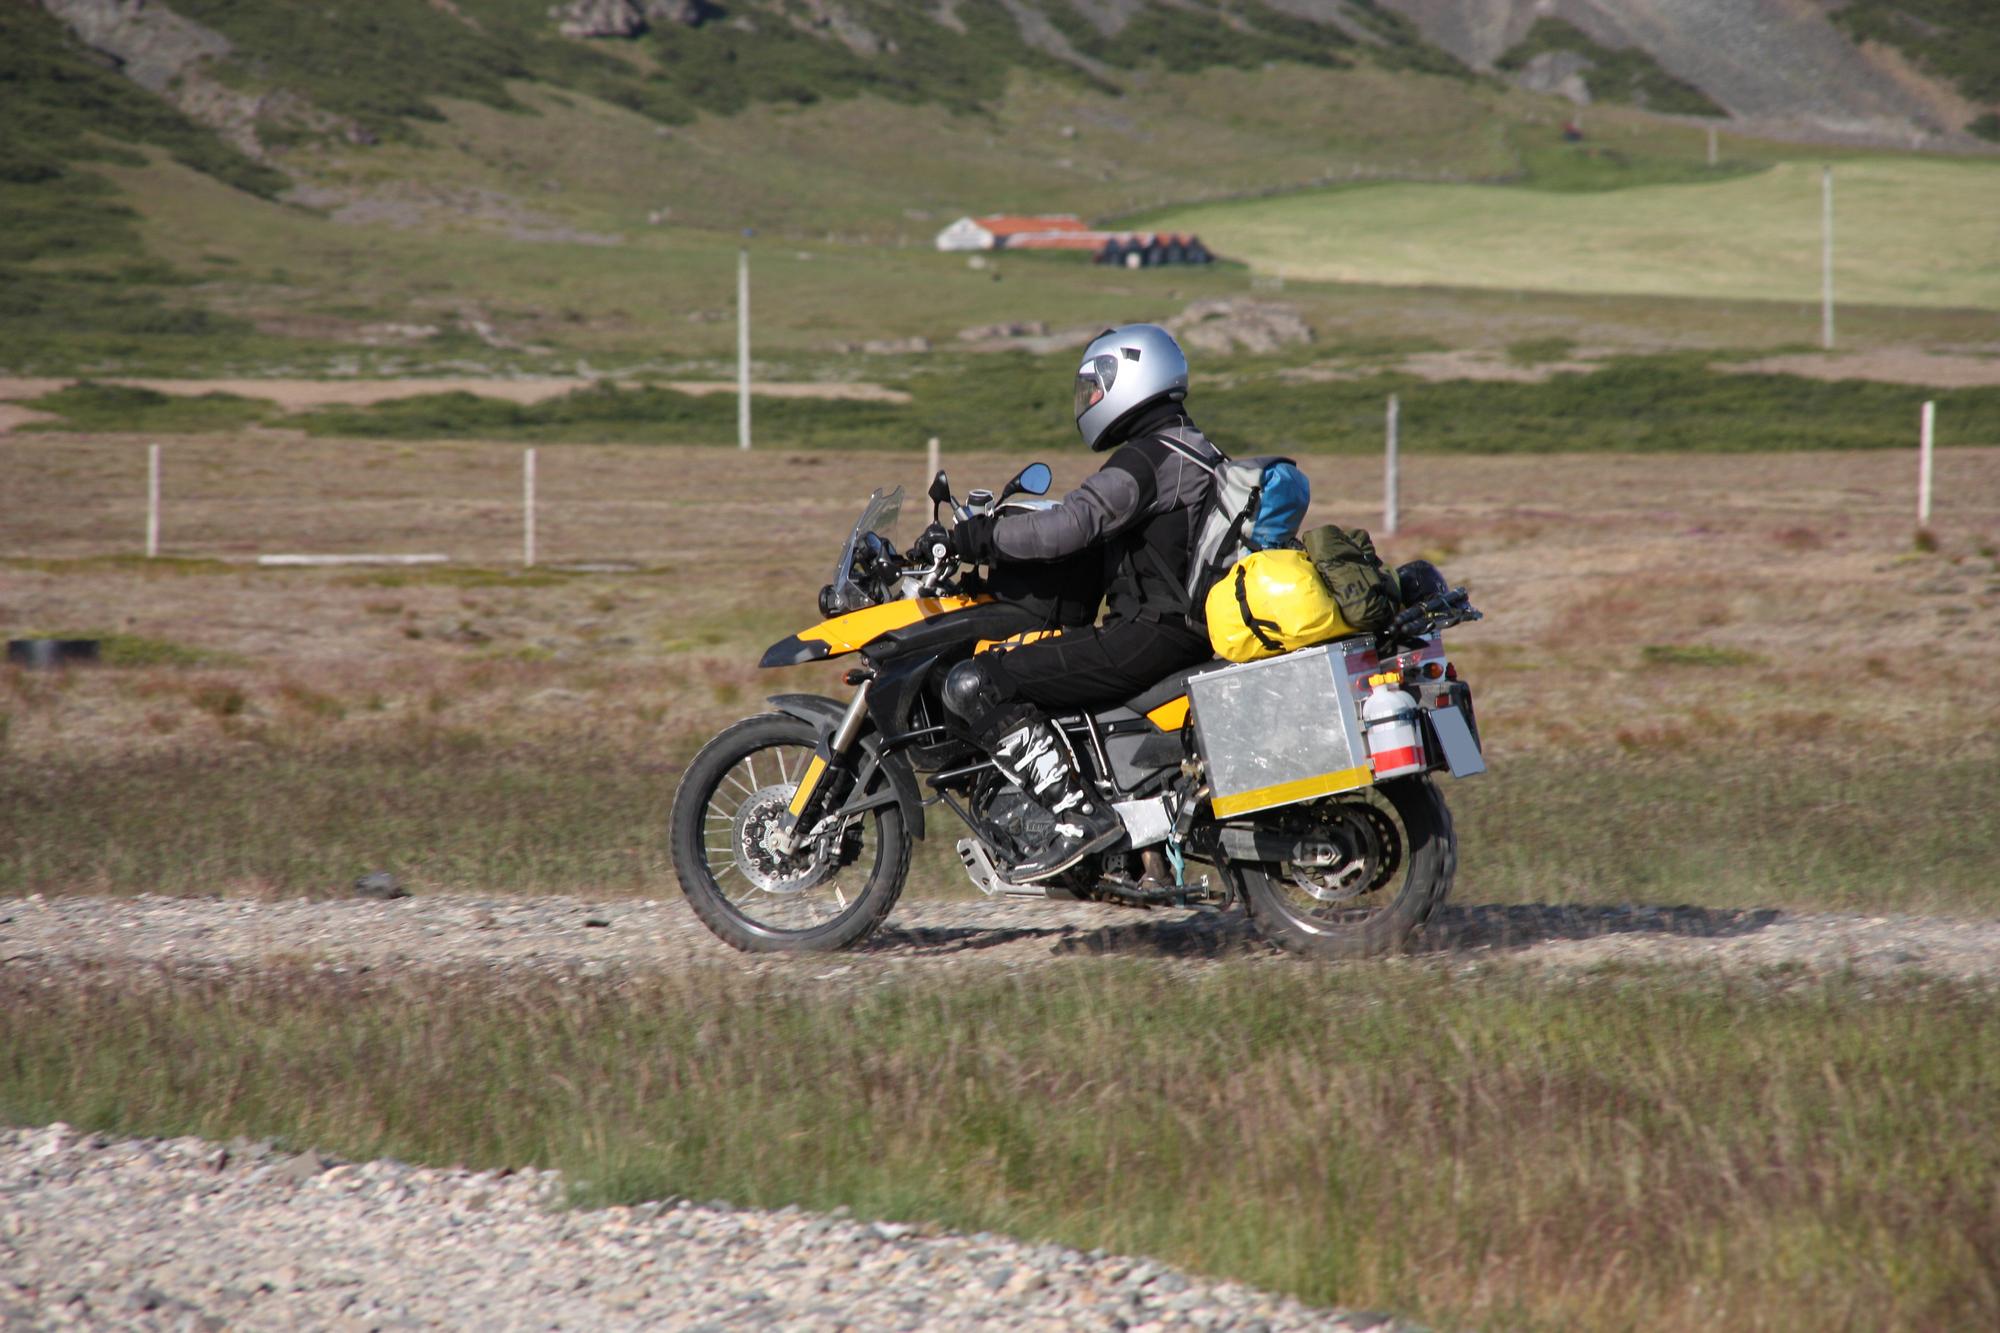 Motorcycle adventure in Iceland. Off-road biking. Traveling by motorbike.